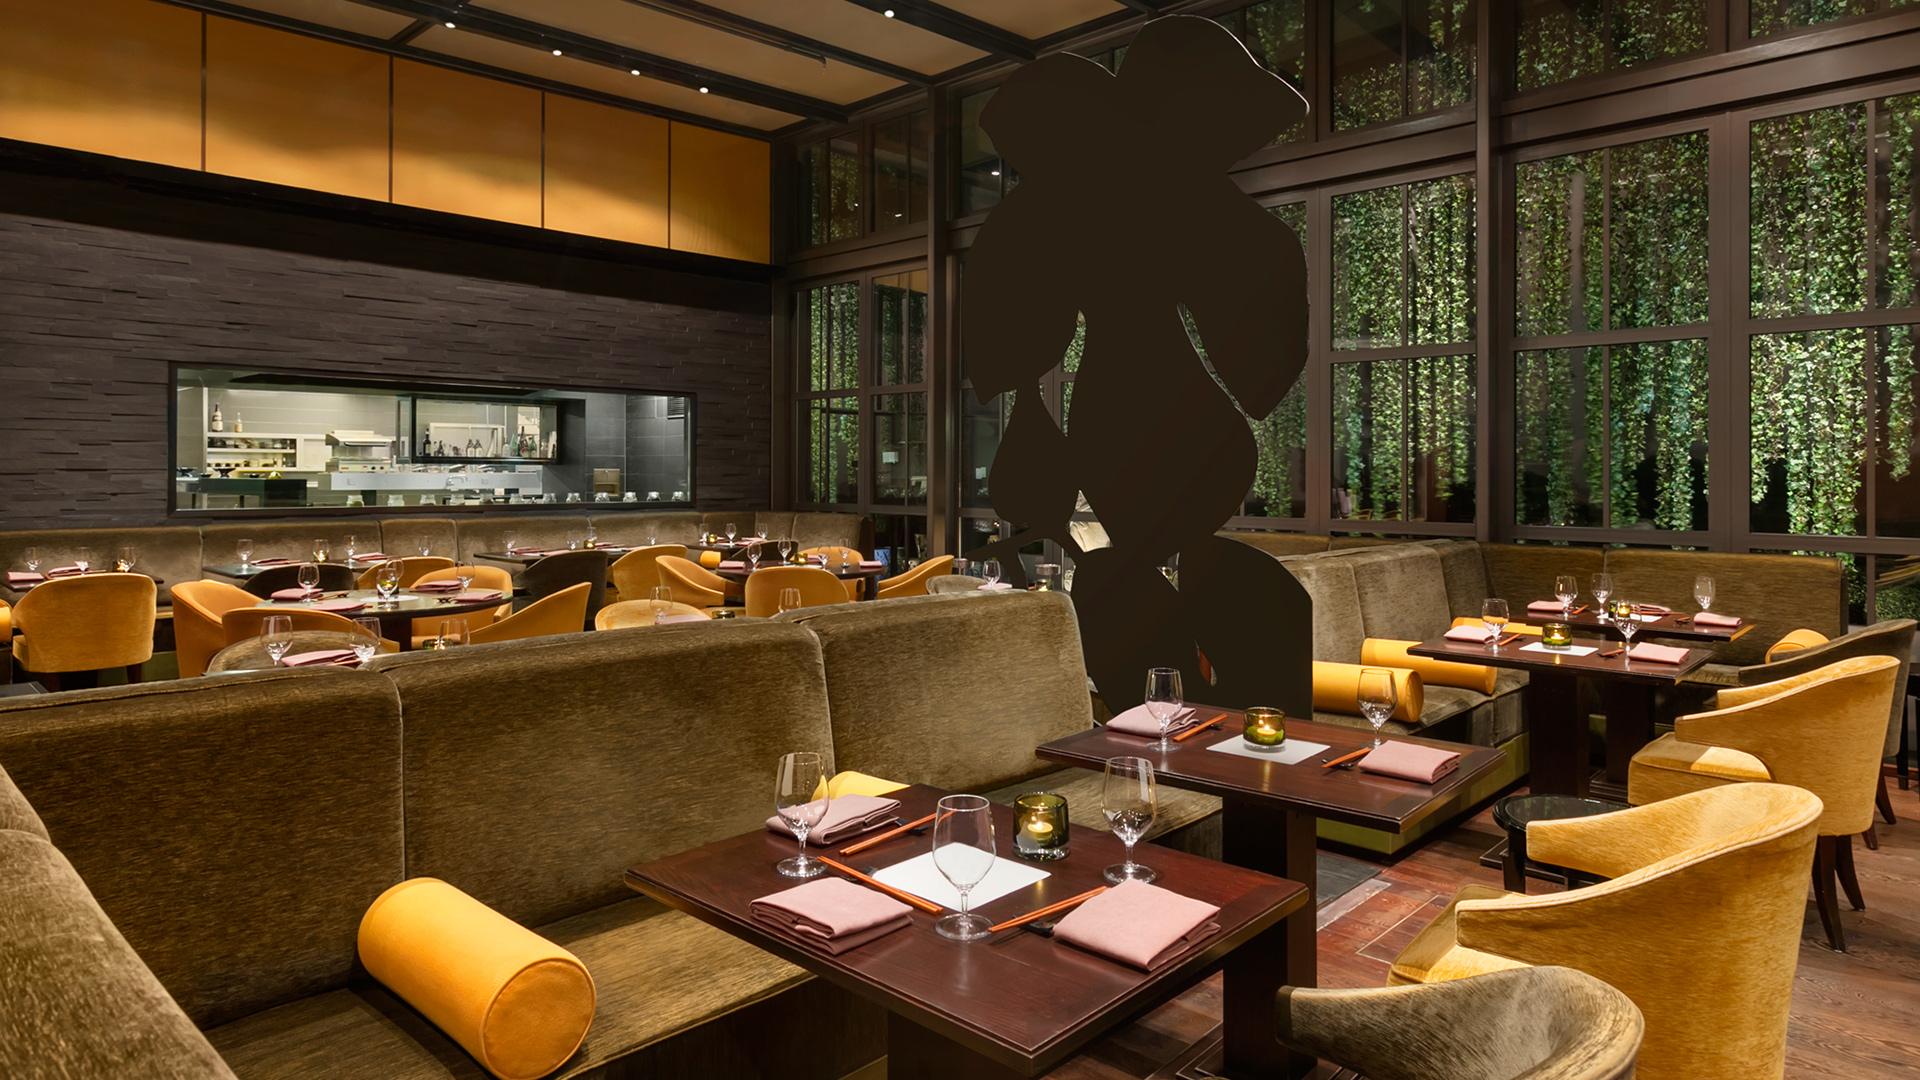 sra bua by tim raue restaurant fiylo. Black Bedroom Furniture Sets. Home Design Ideas